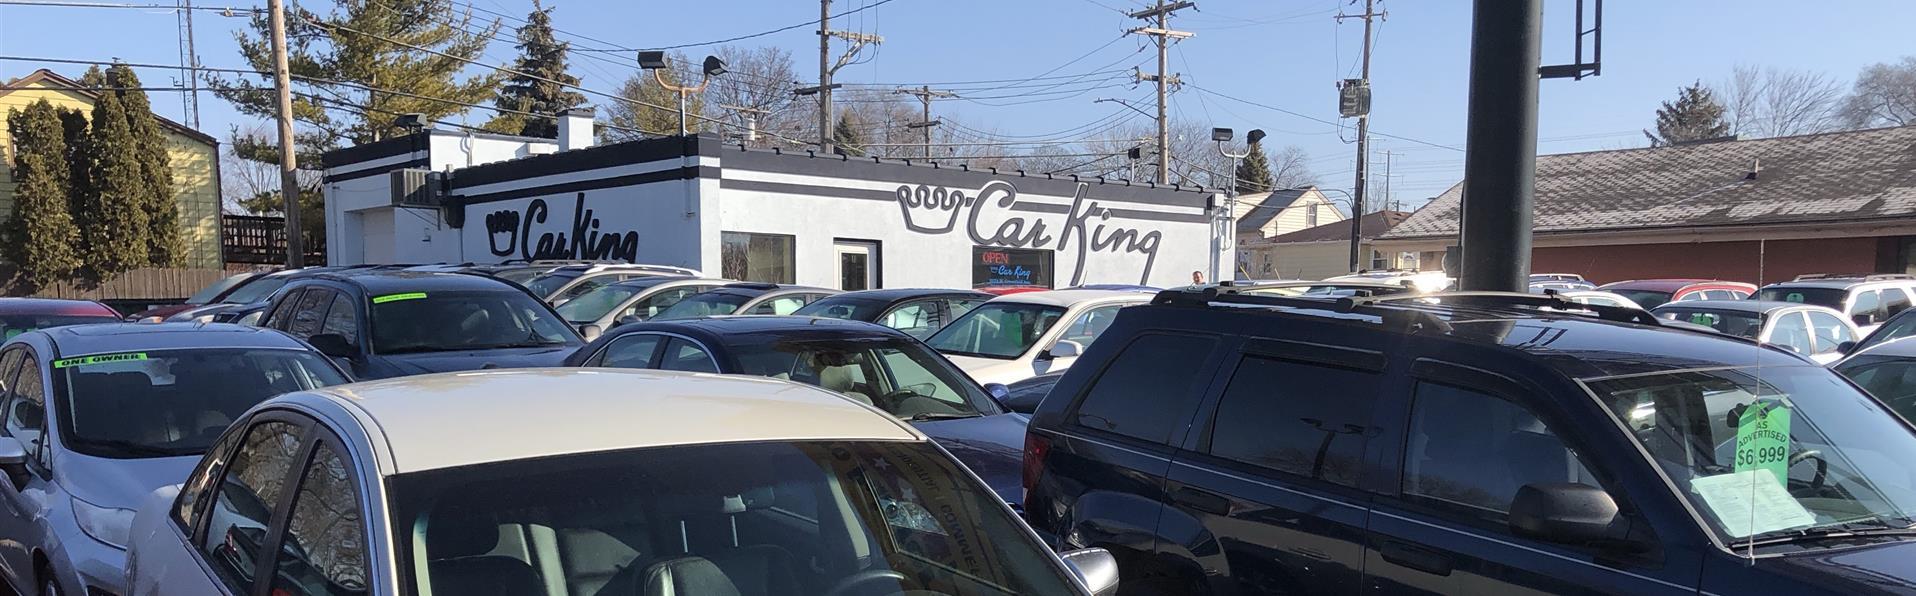 Used Cars Milwaukee WI | Used Cars & Trucks WI | Car King